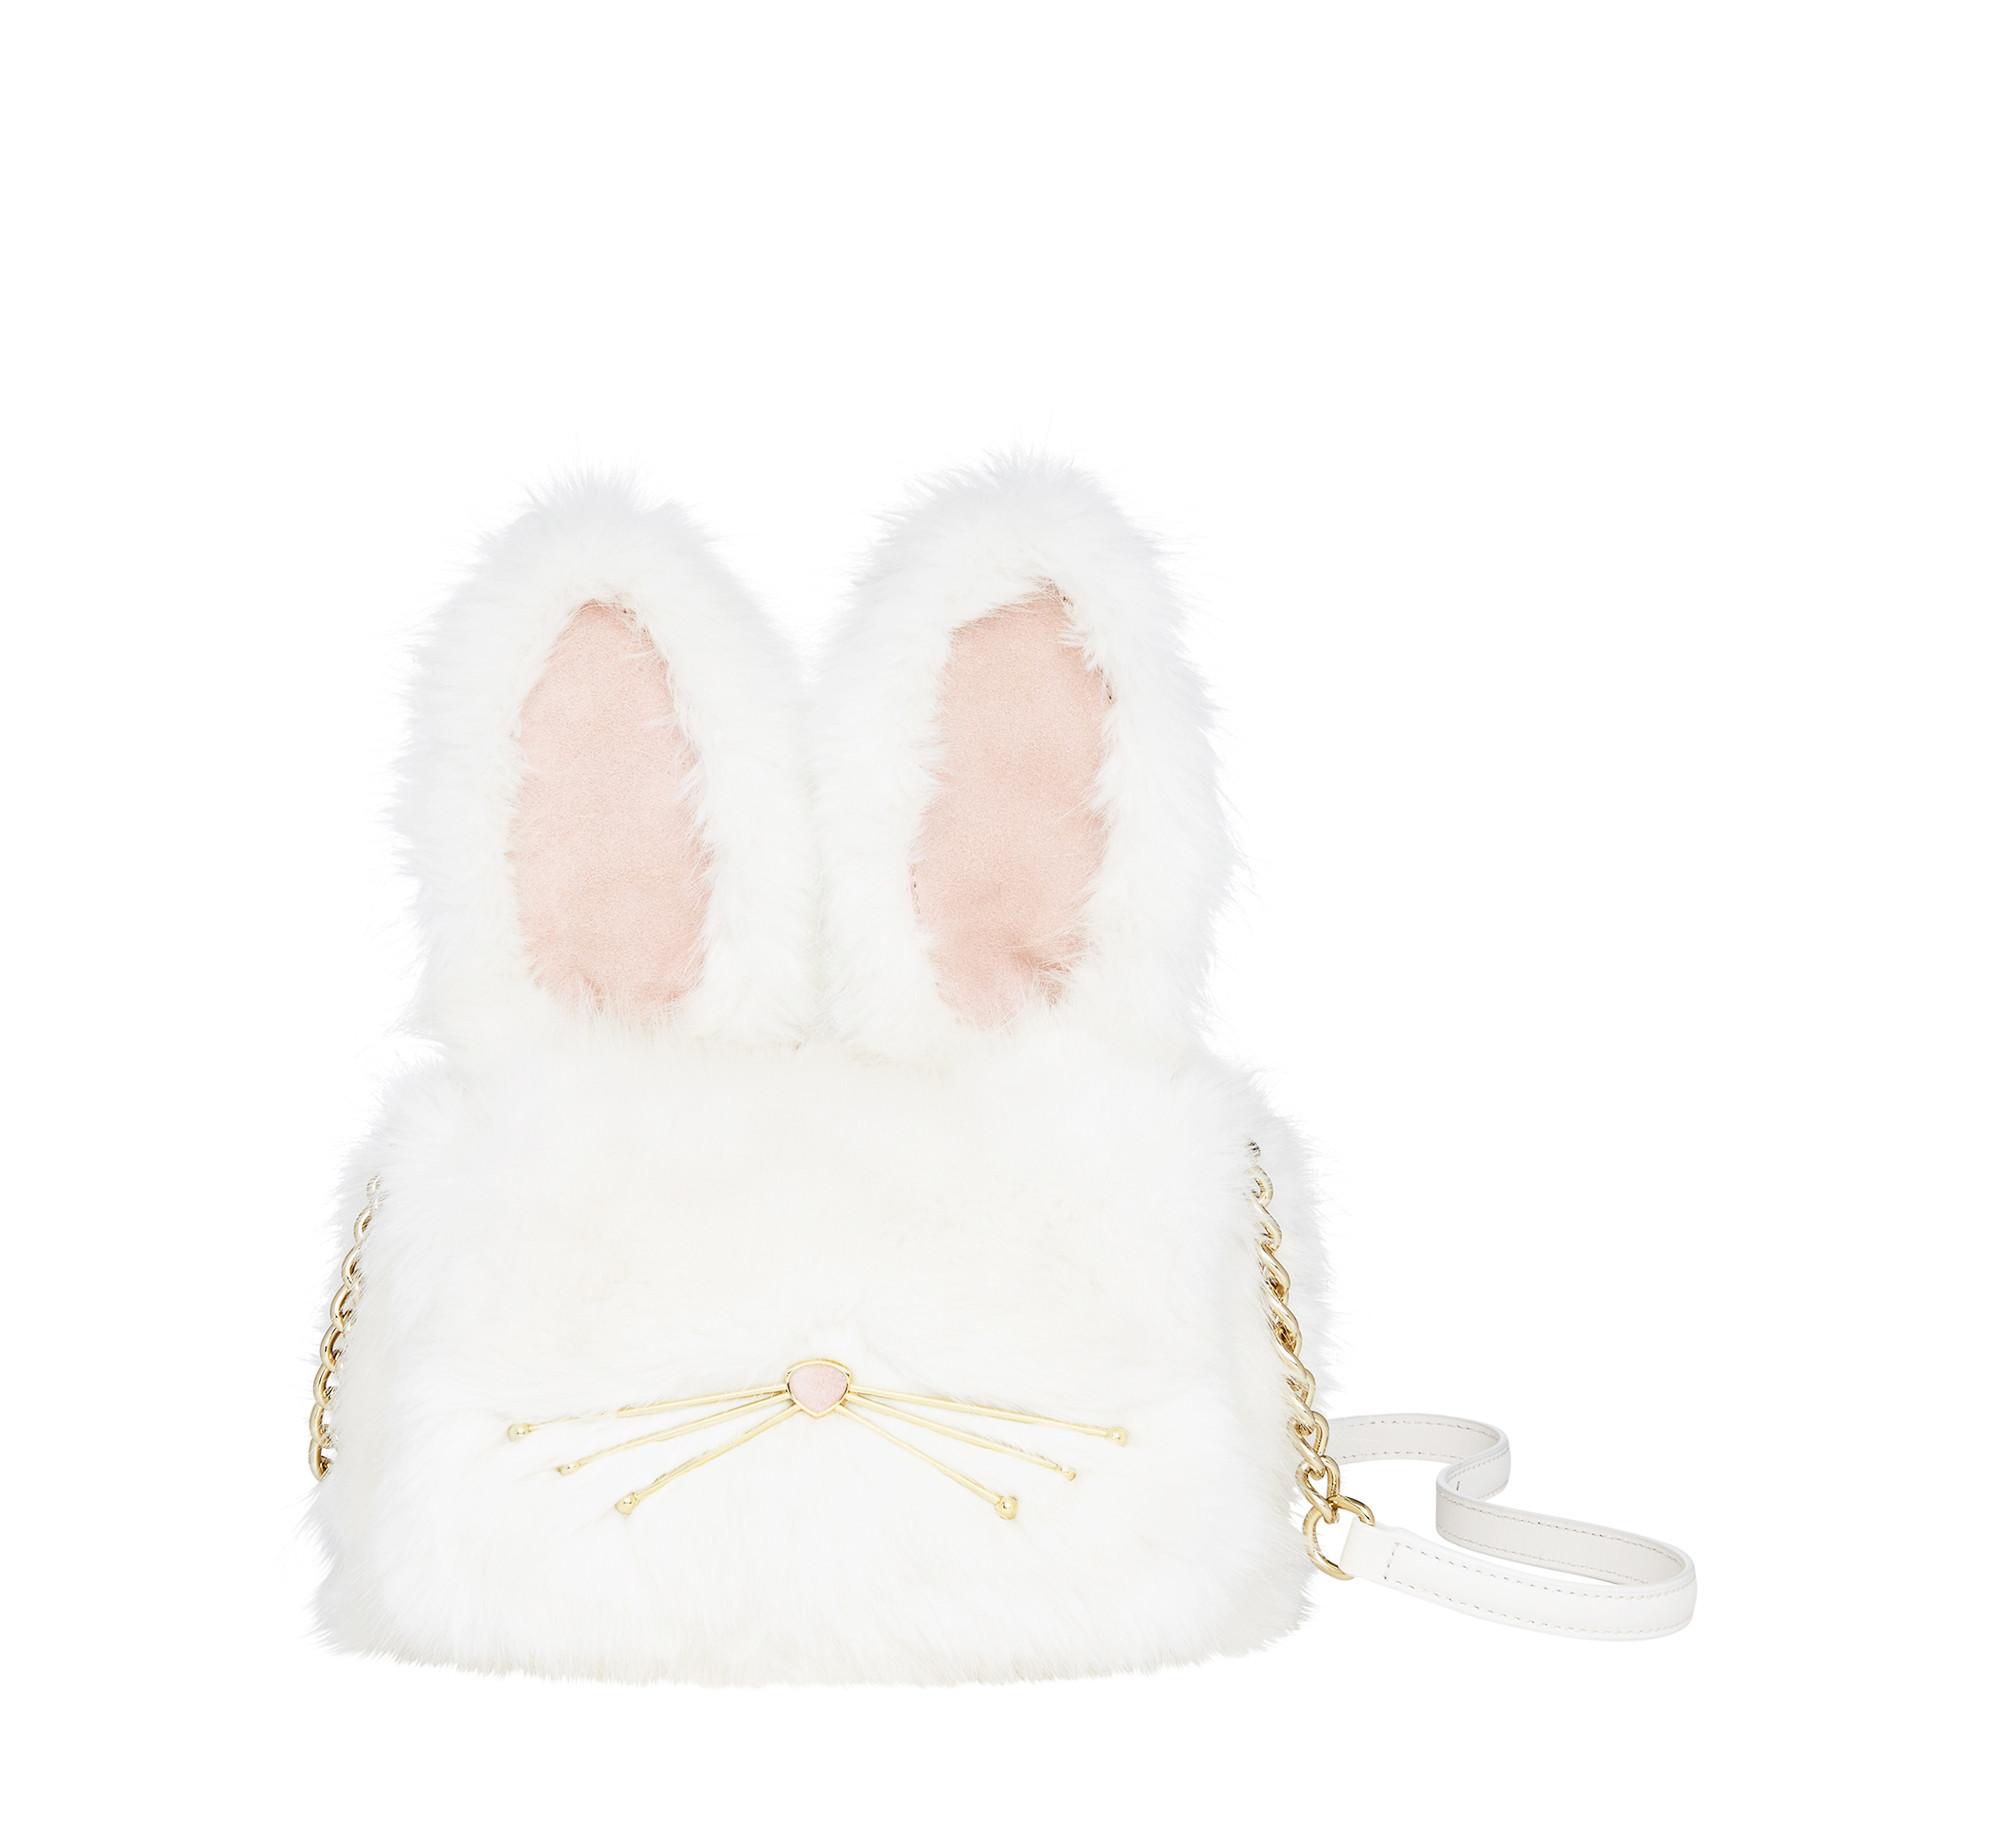 695440263 Kate Spade Make Magic Rabbit Shoulder Bag and Muff, $398 at katespade.com